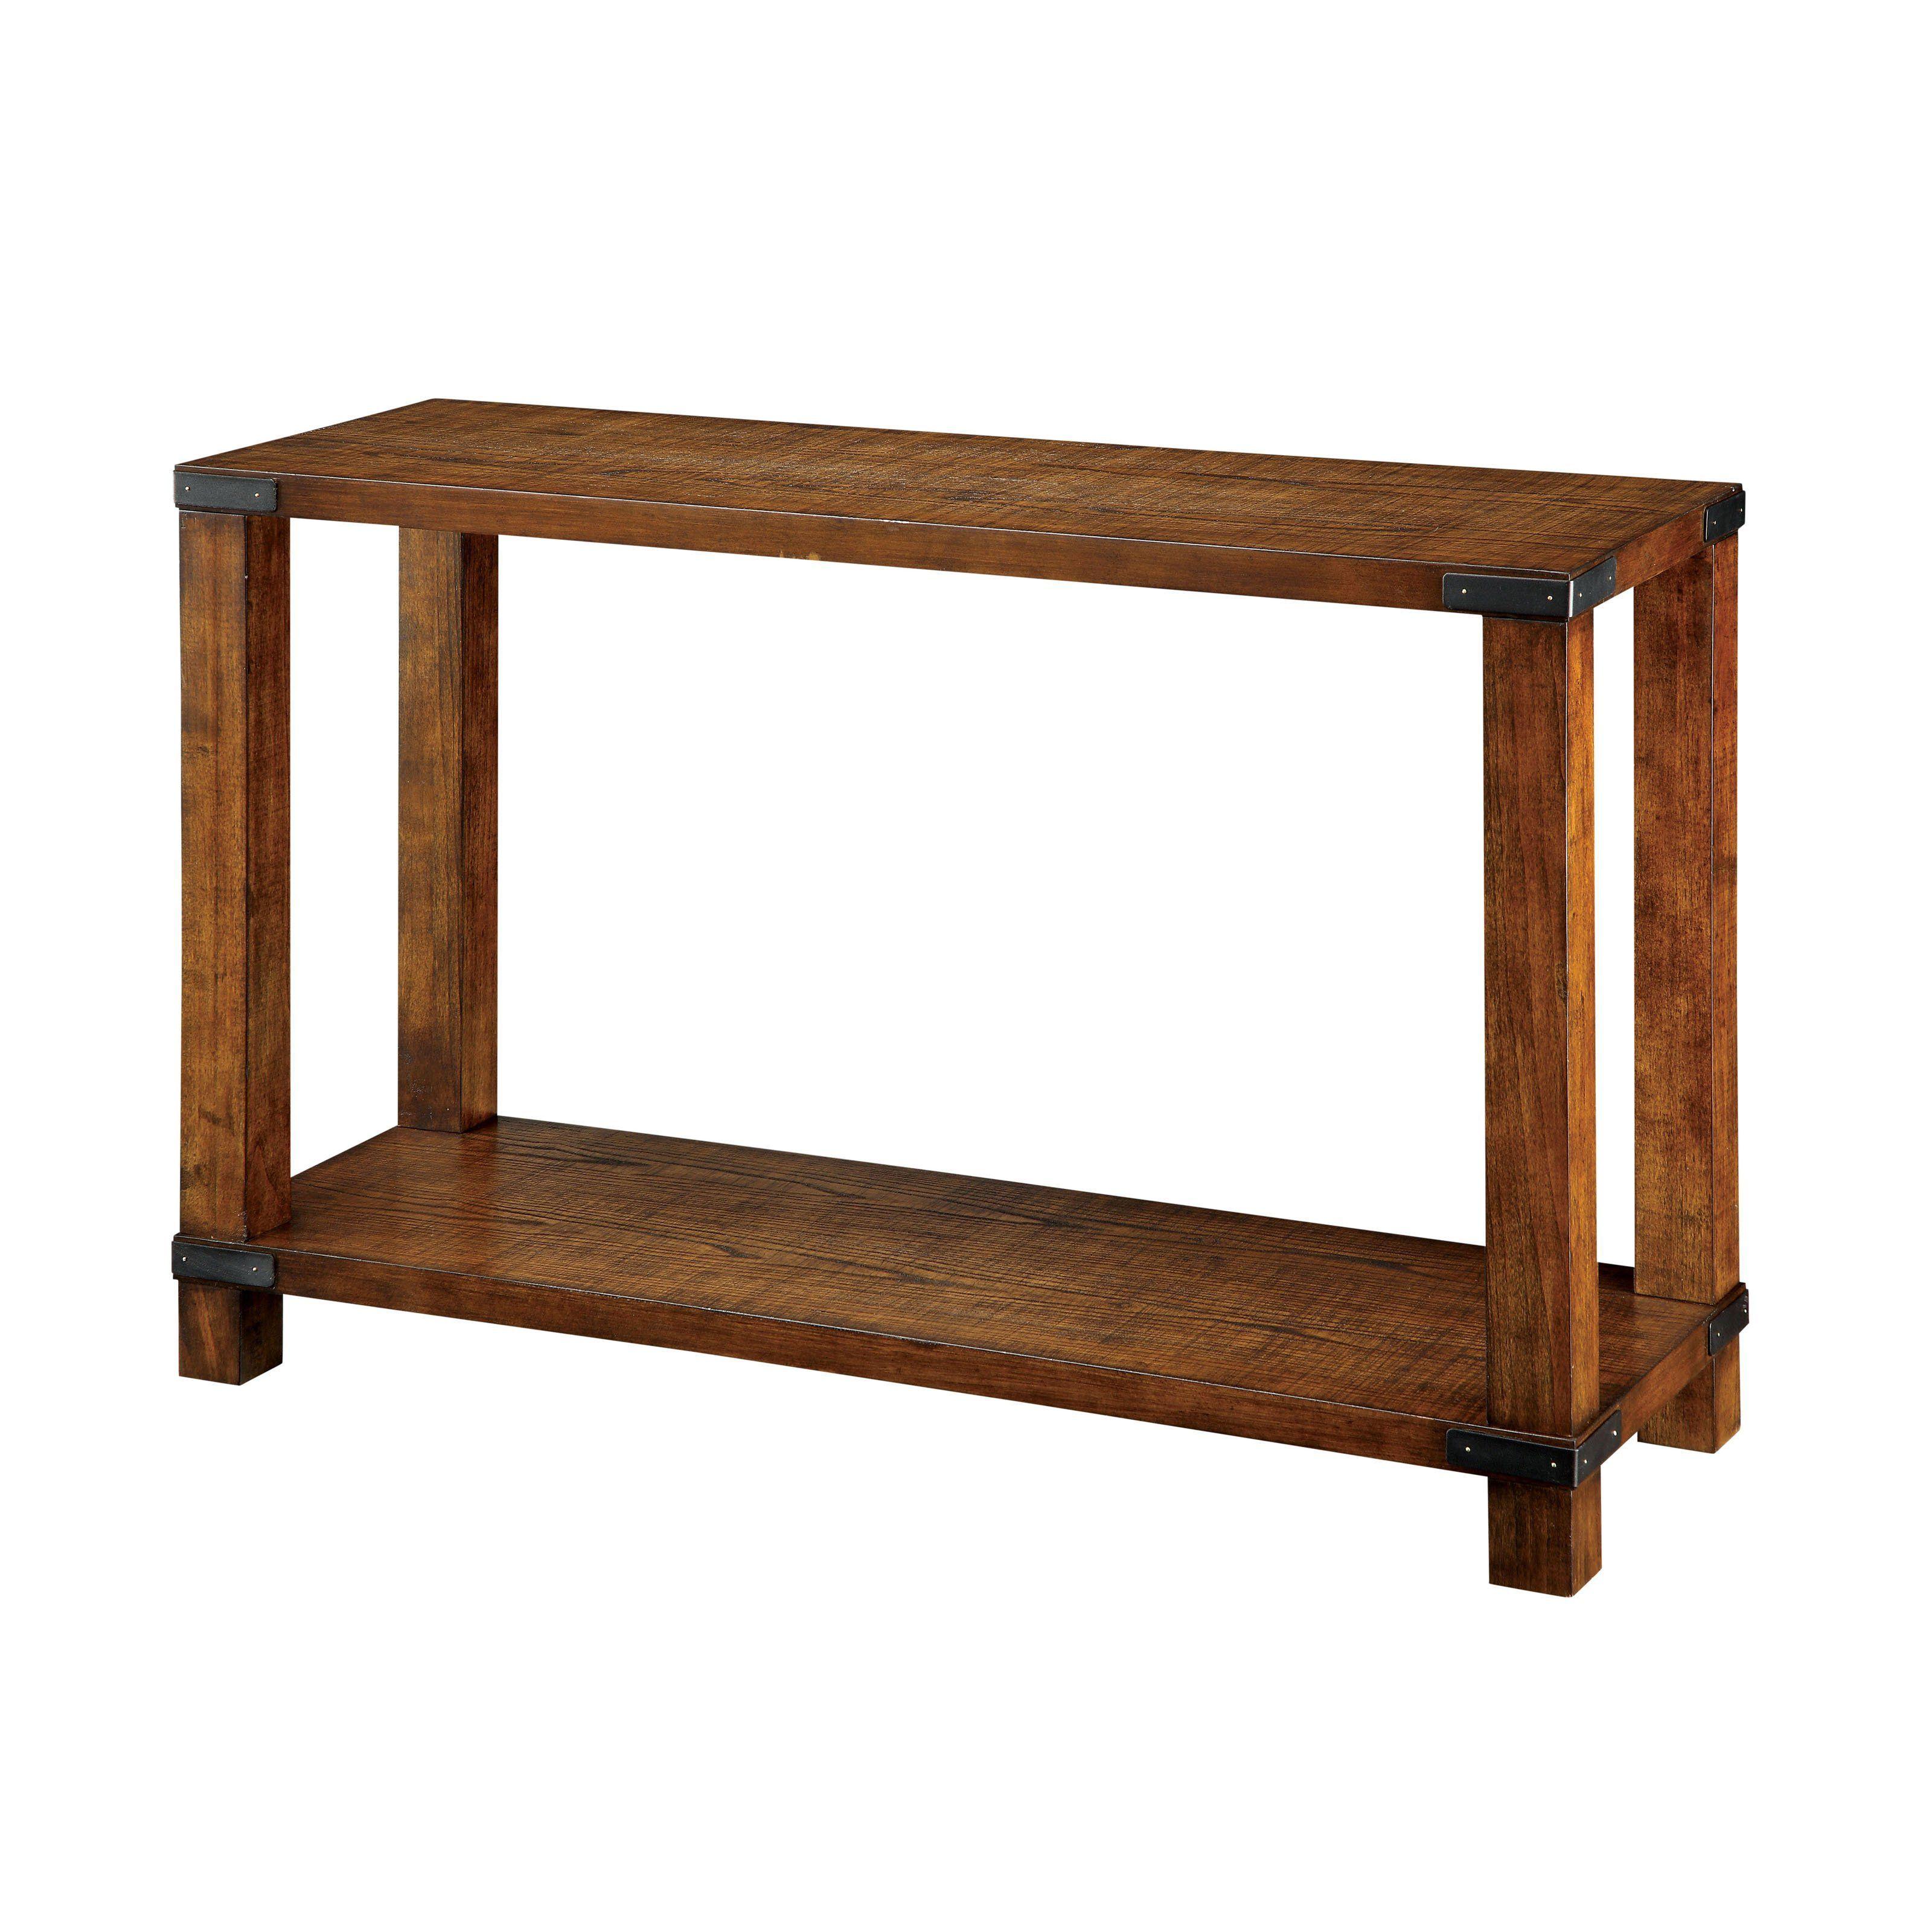 Furniture Of America Titus Dark Oak Sofa Table With Metal Hardware